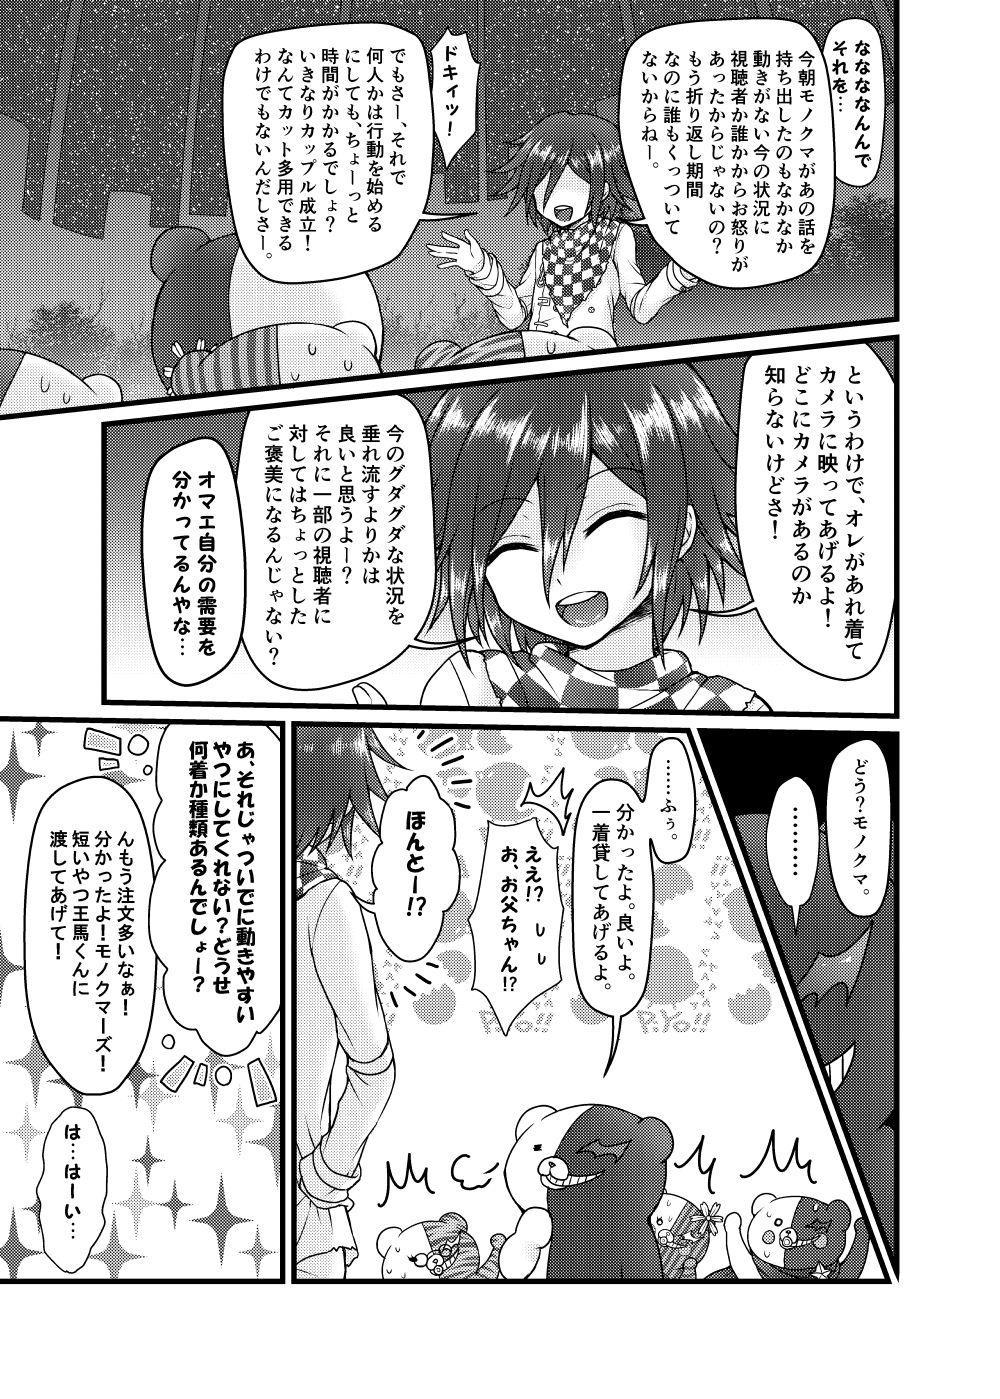 Usotsuki Hanayome 11